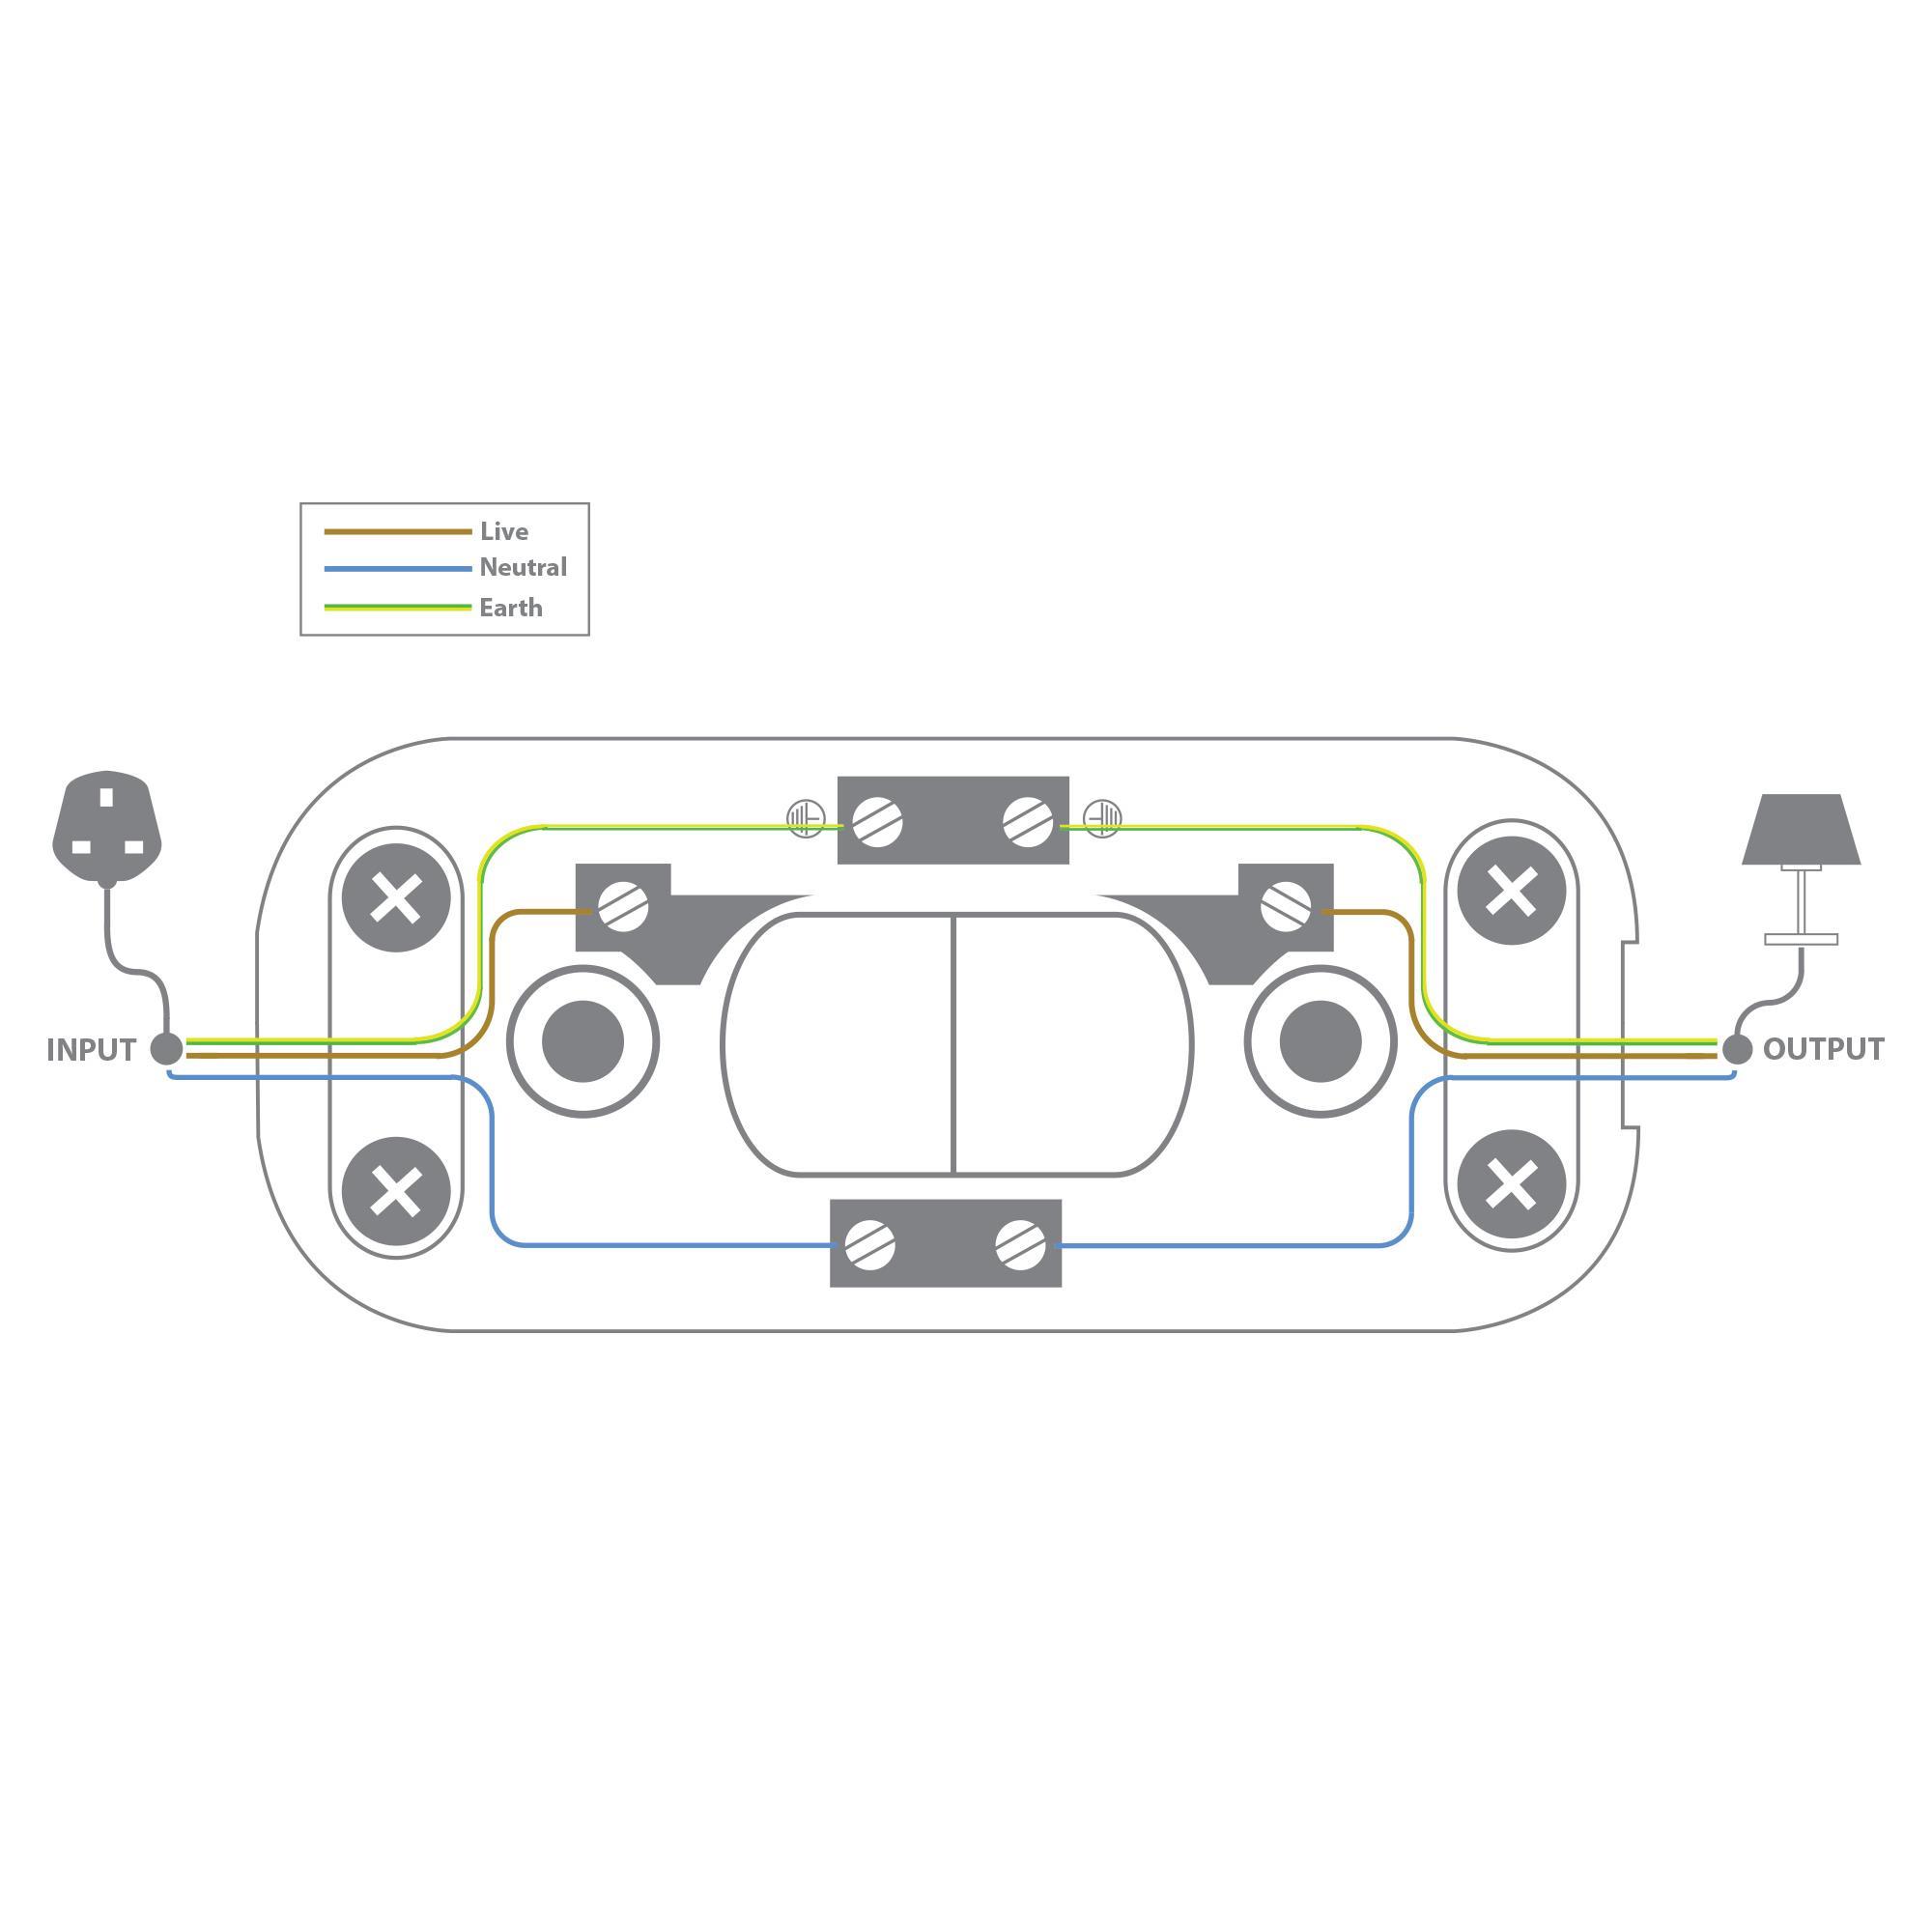 3 Amp 120 Volt Rocker Switch